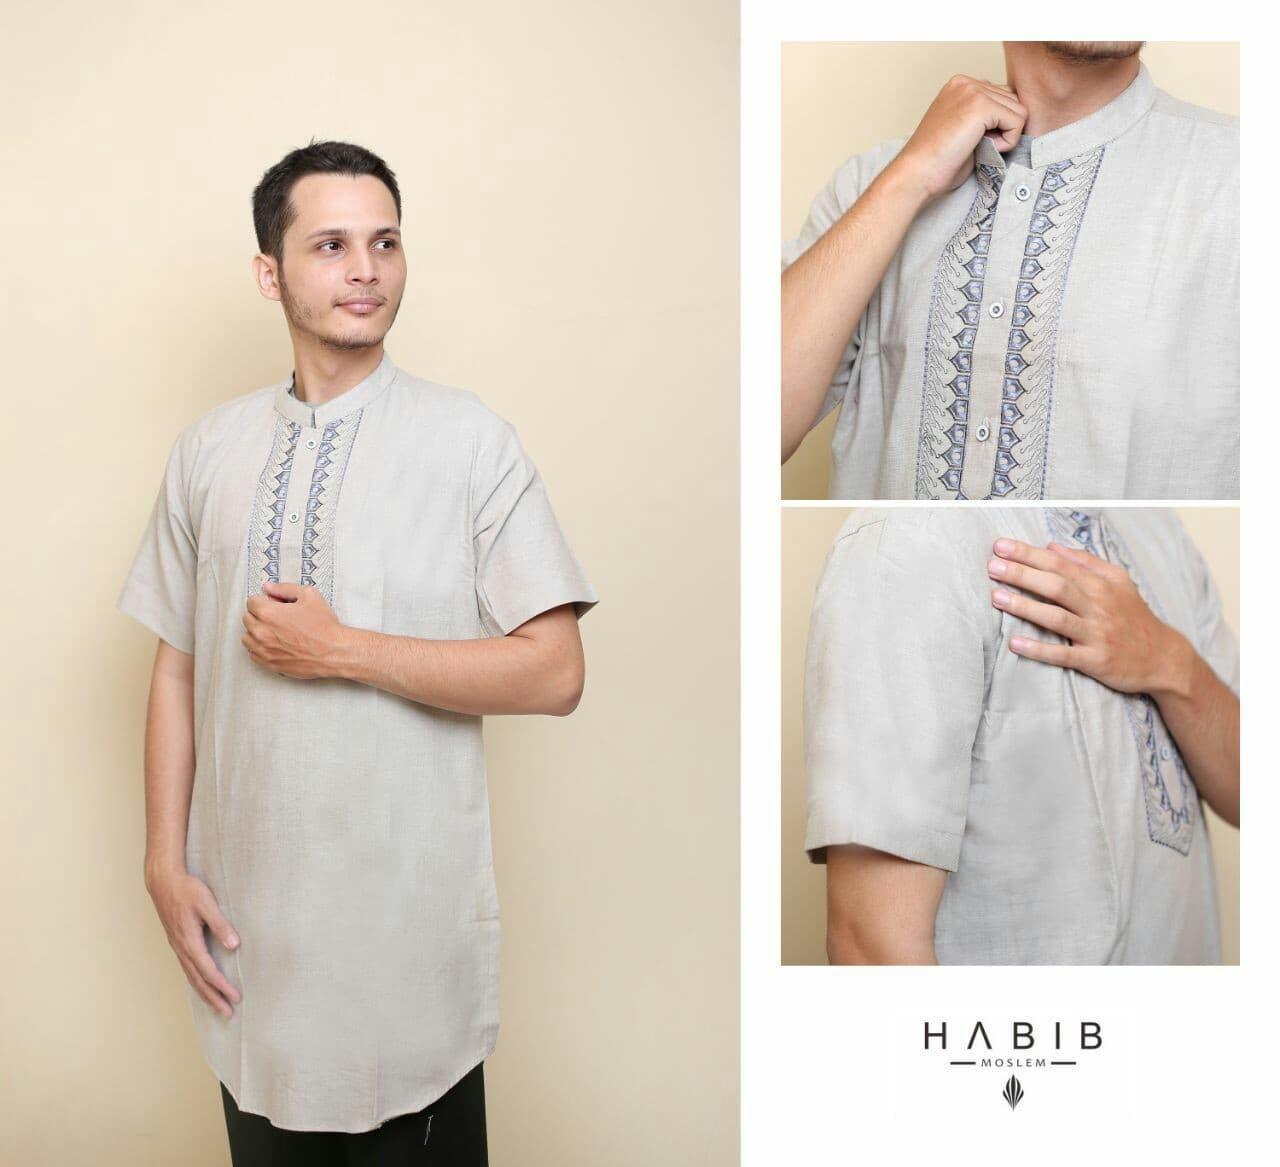 Baju Pria Kemeja Baju Koko Gaul Habib Pendek Abu Muda